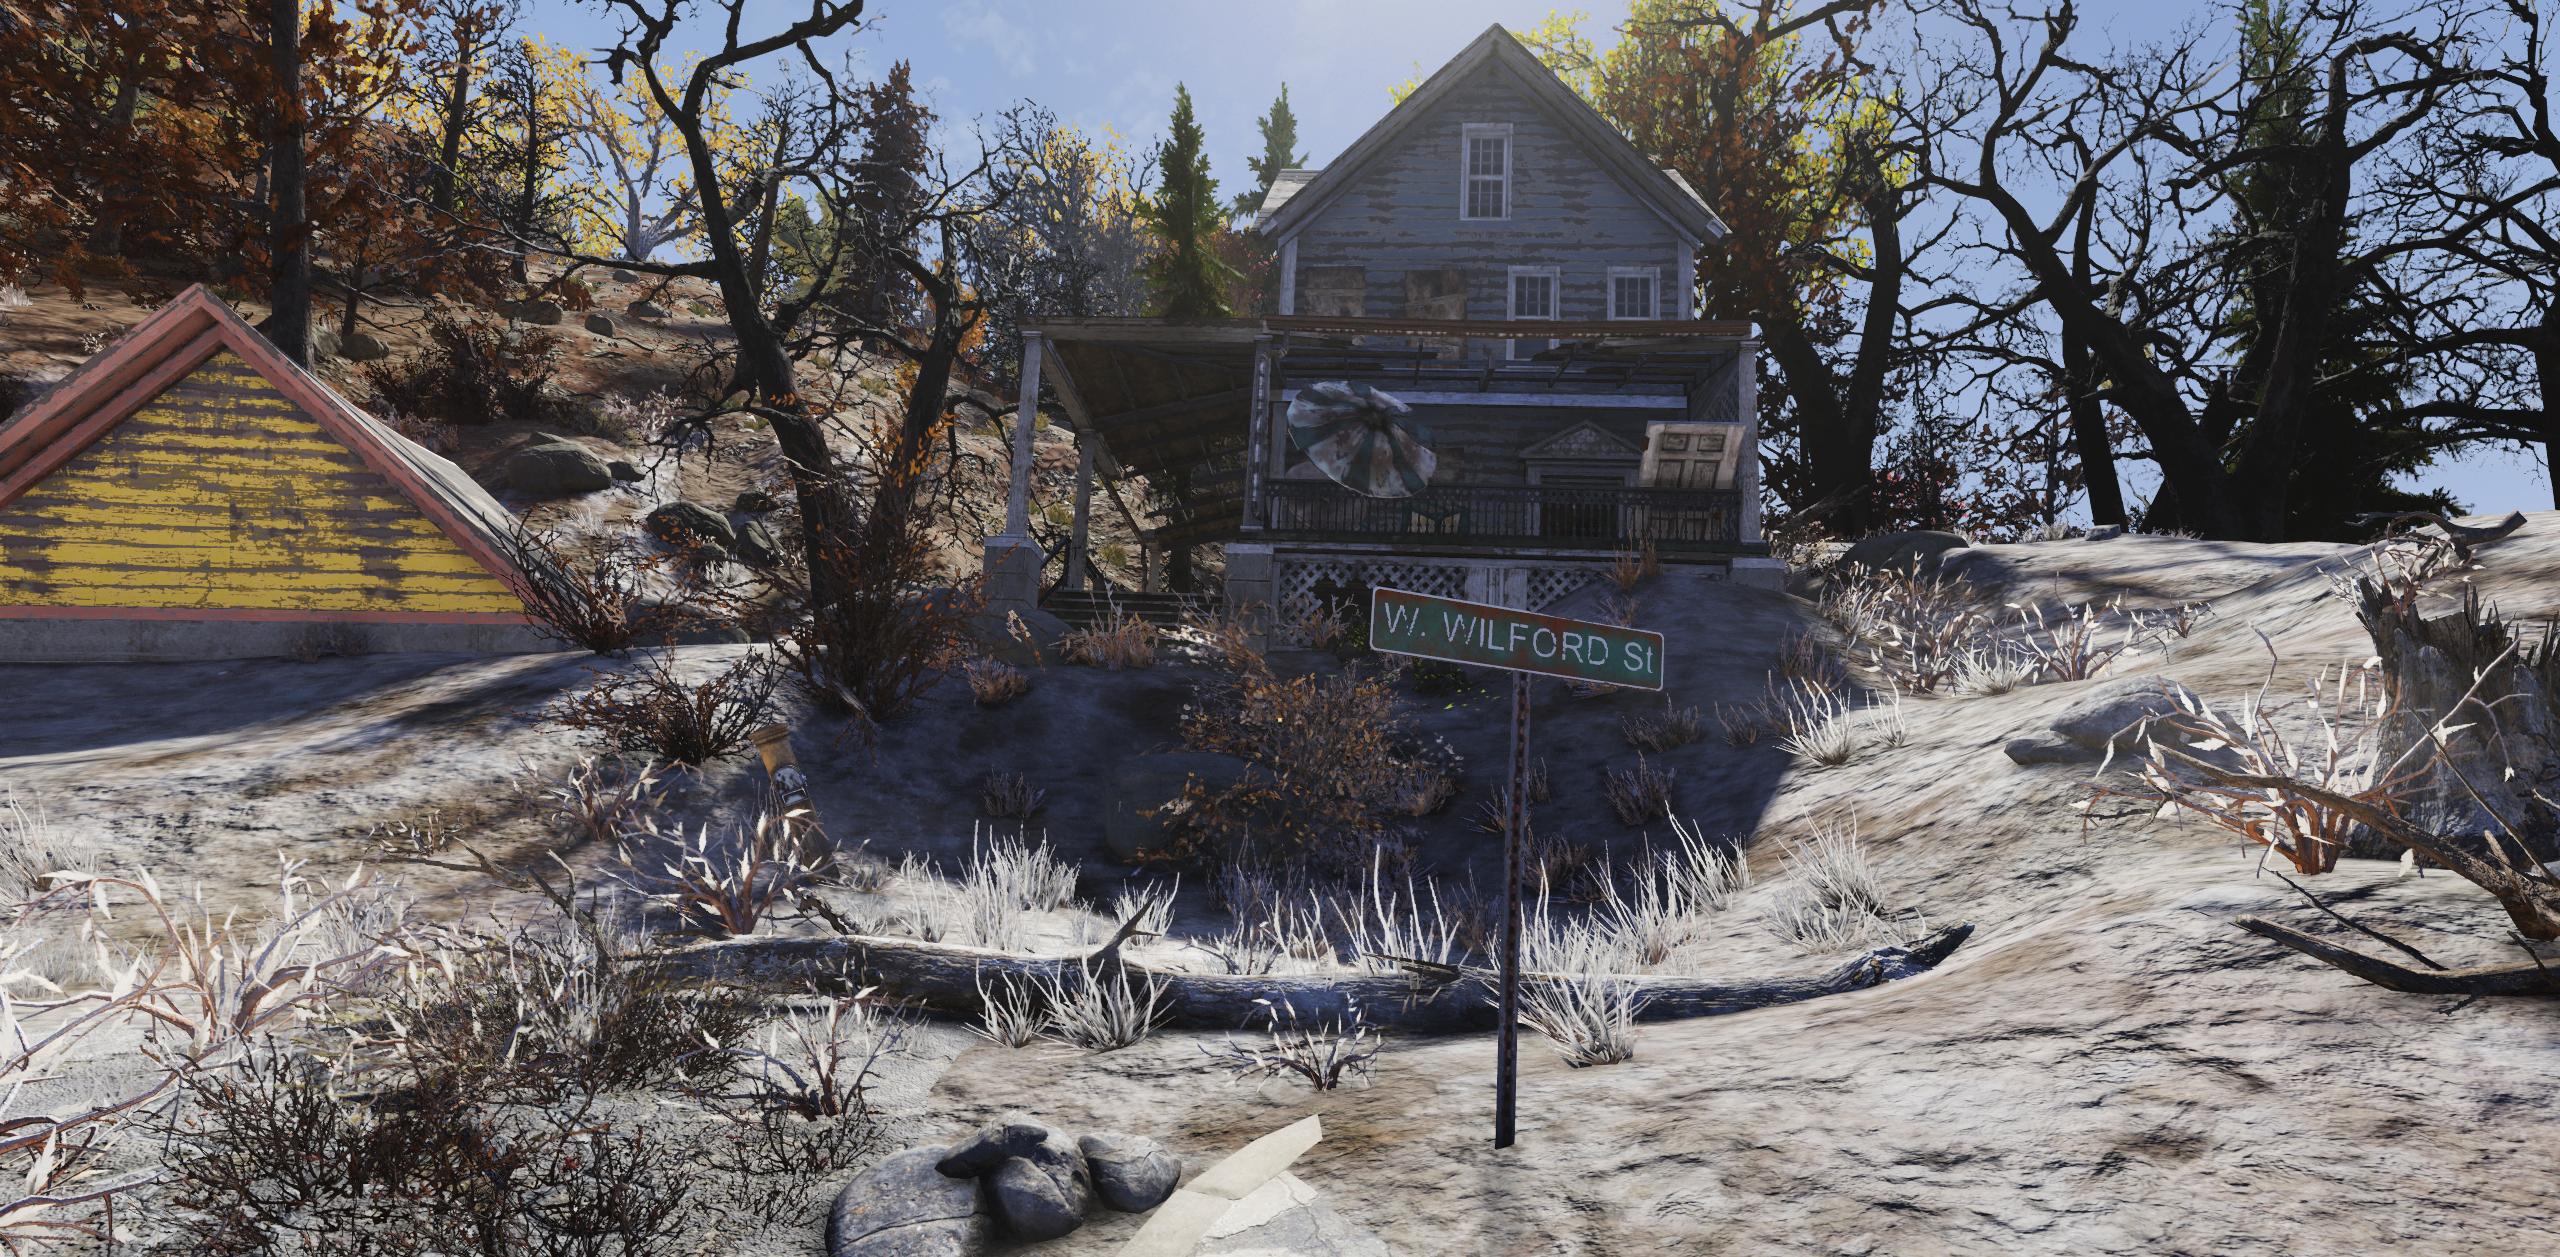 FO76 Otis Pike's house